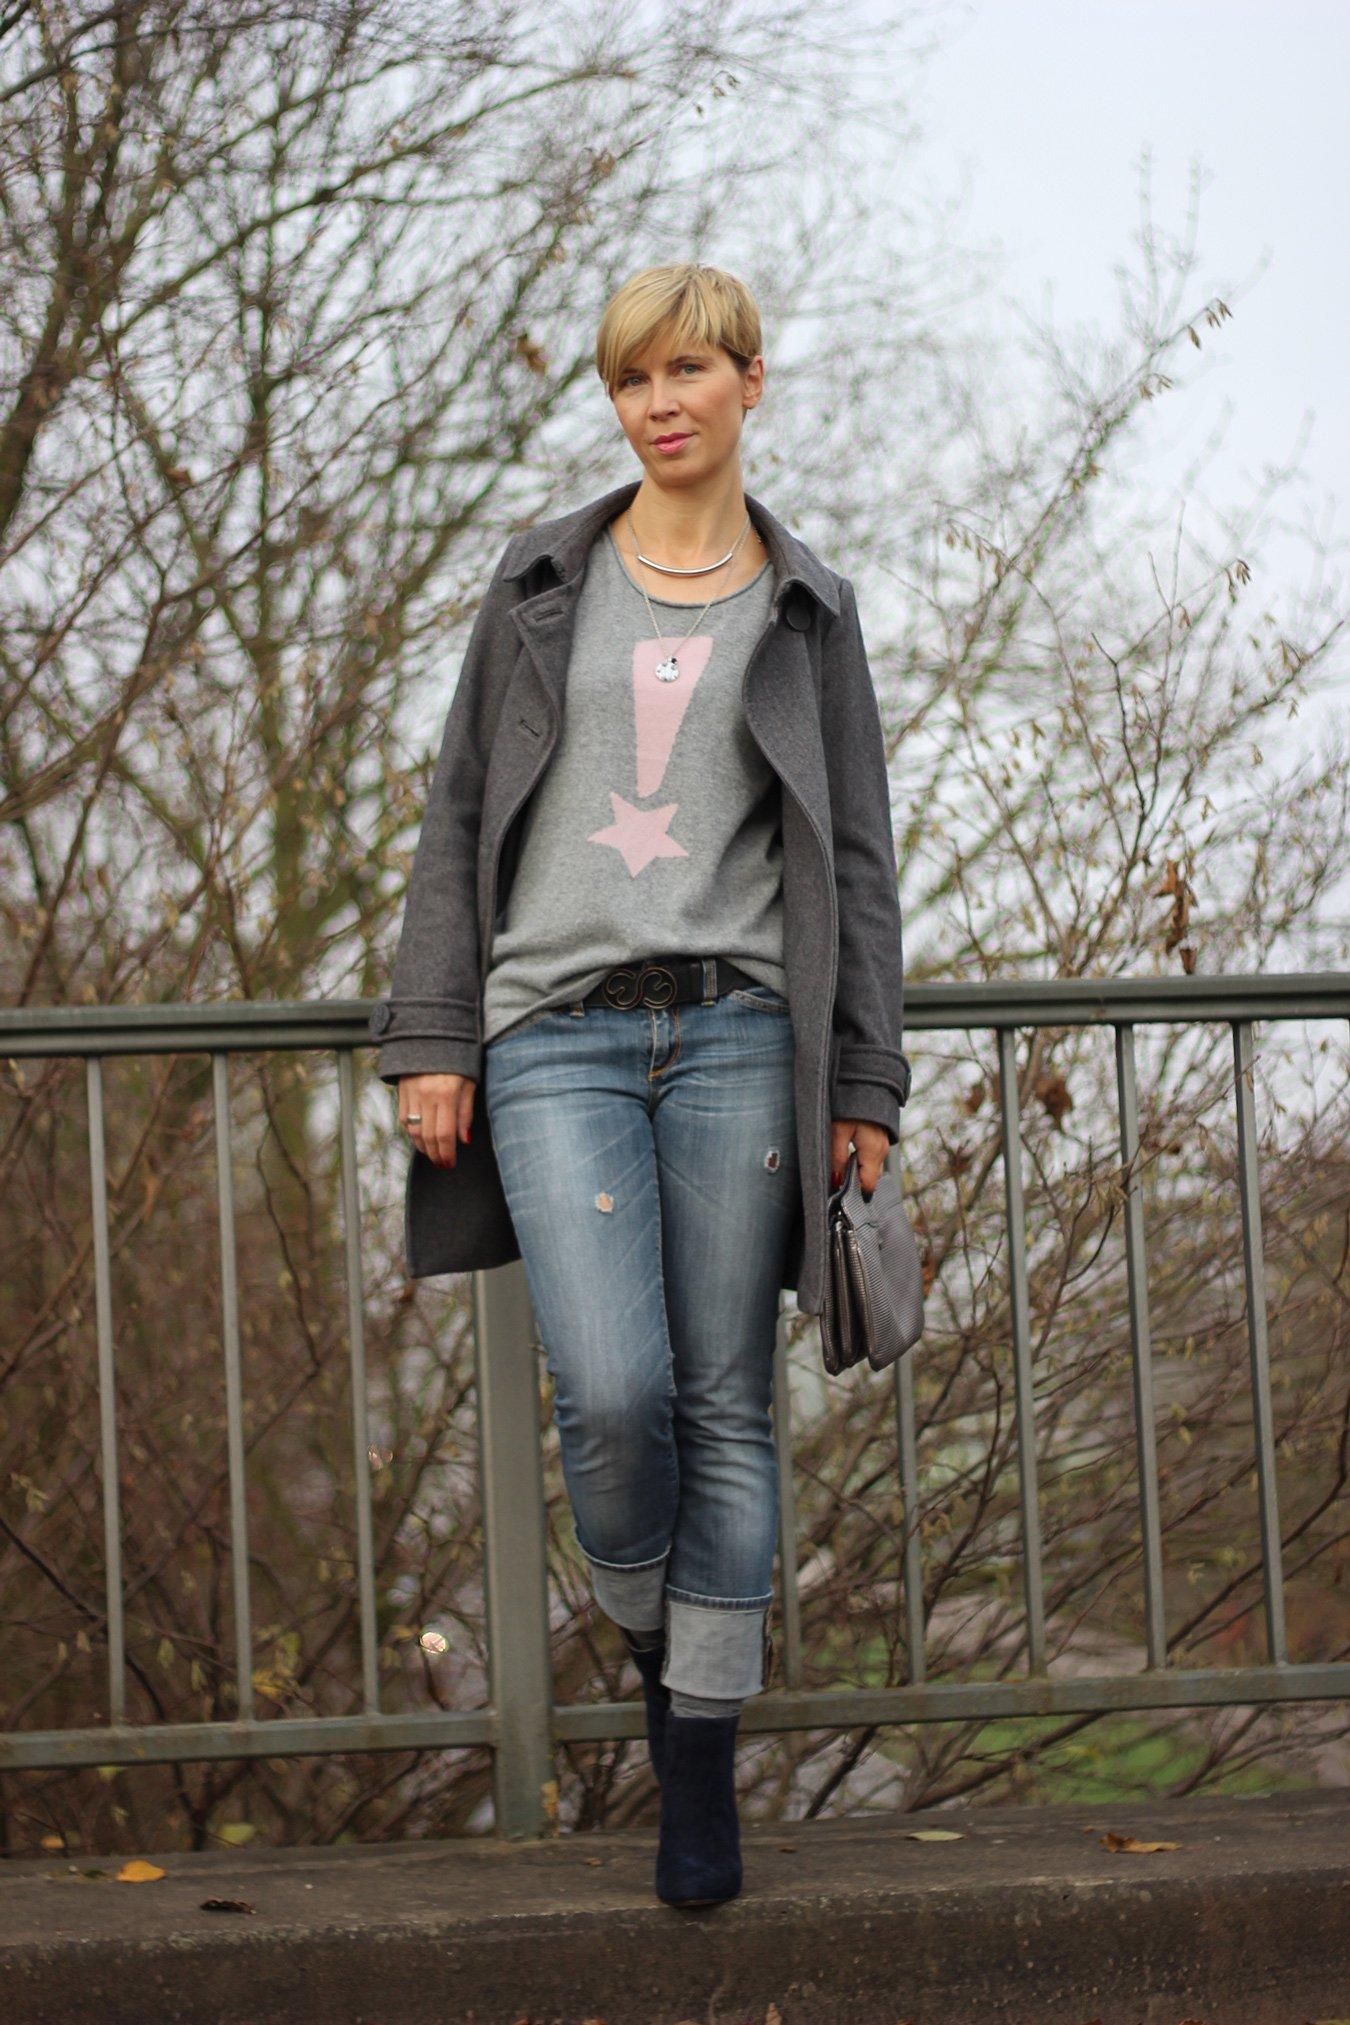 IMG_4527a_ConnyDoll_Kaschmirpulli_SOliver_Jeans_Booties_dunkelblau_rosaundgrau